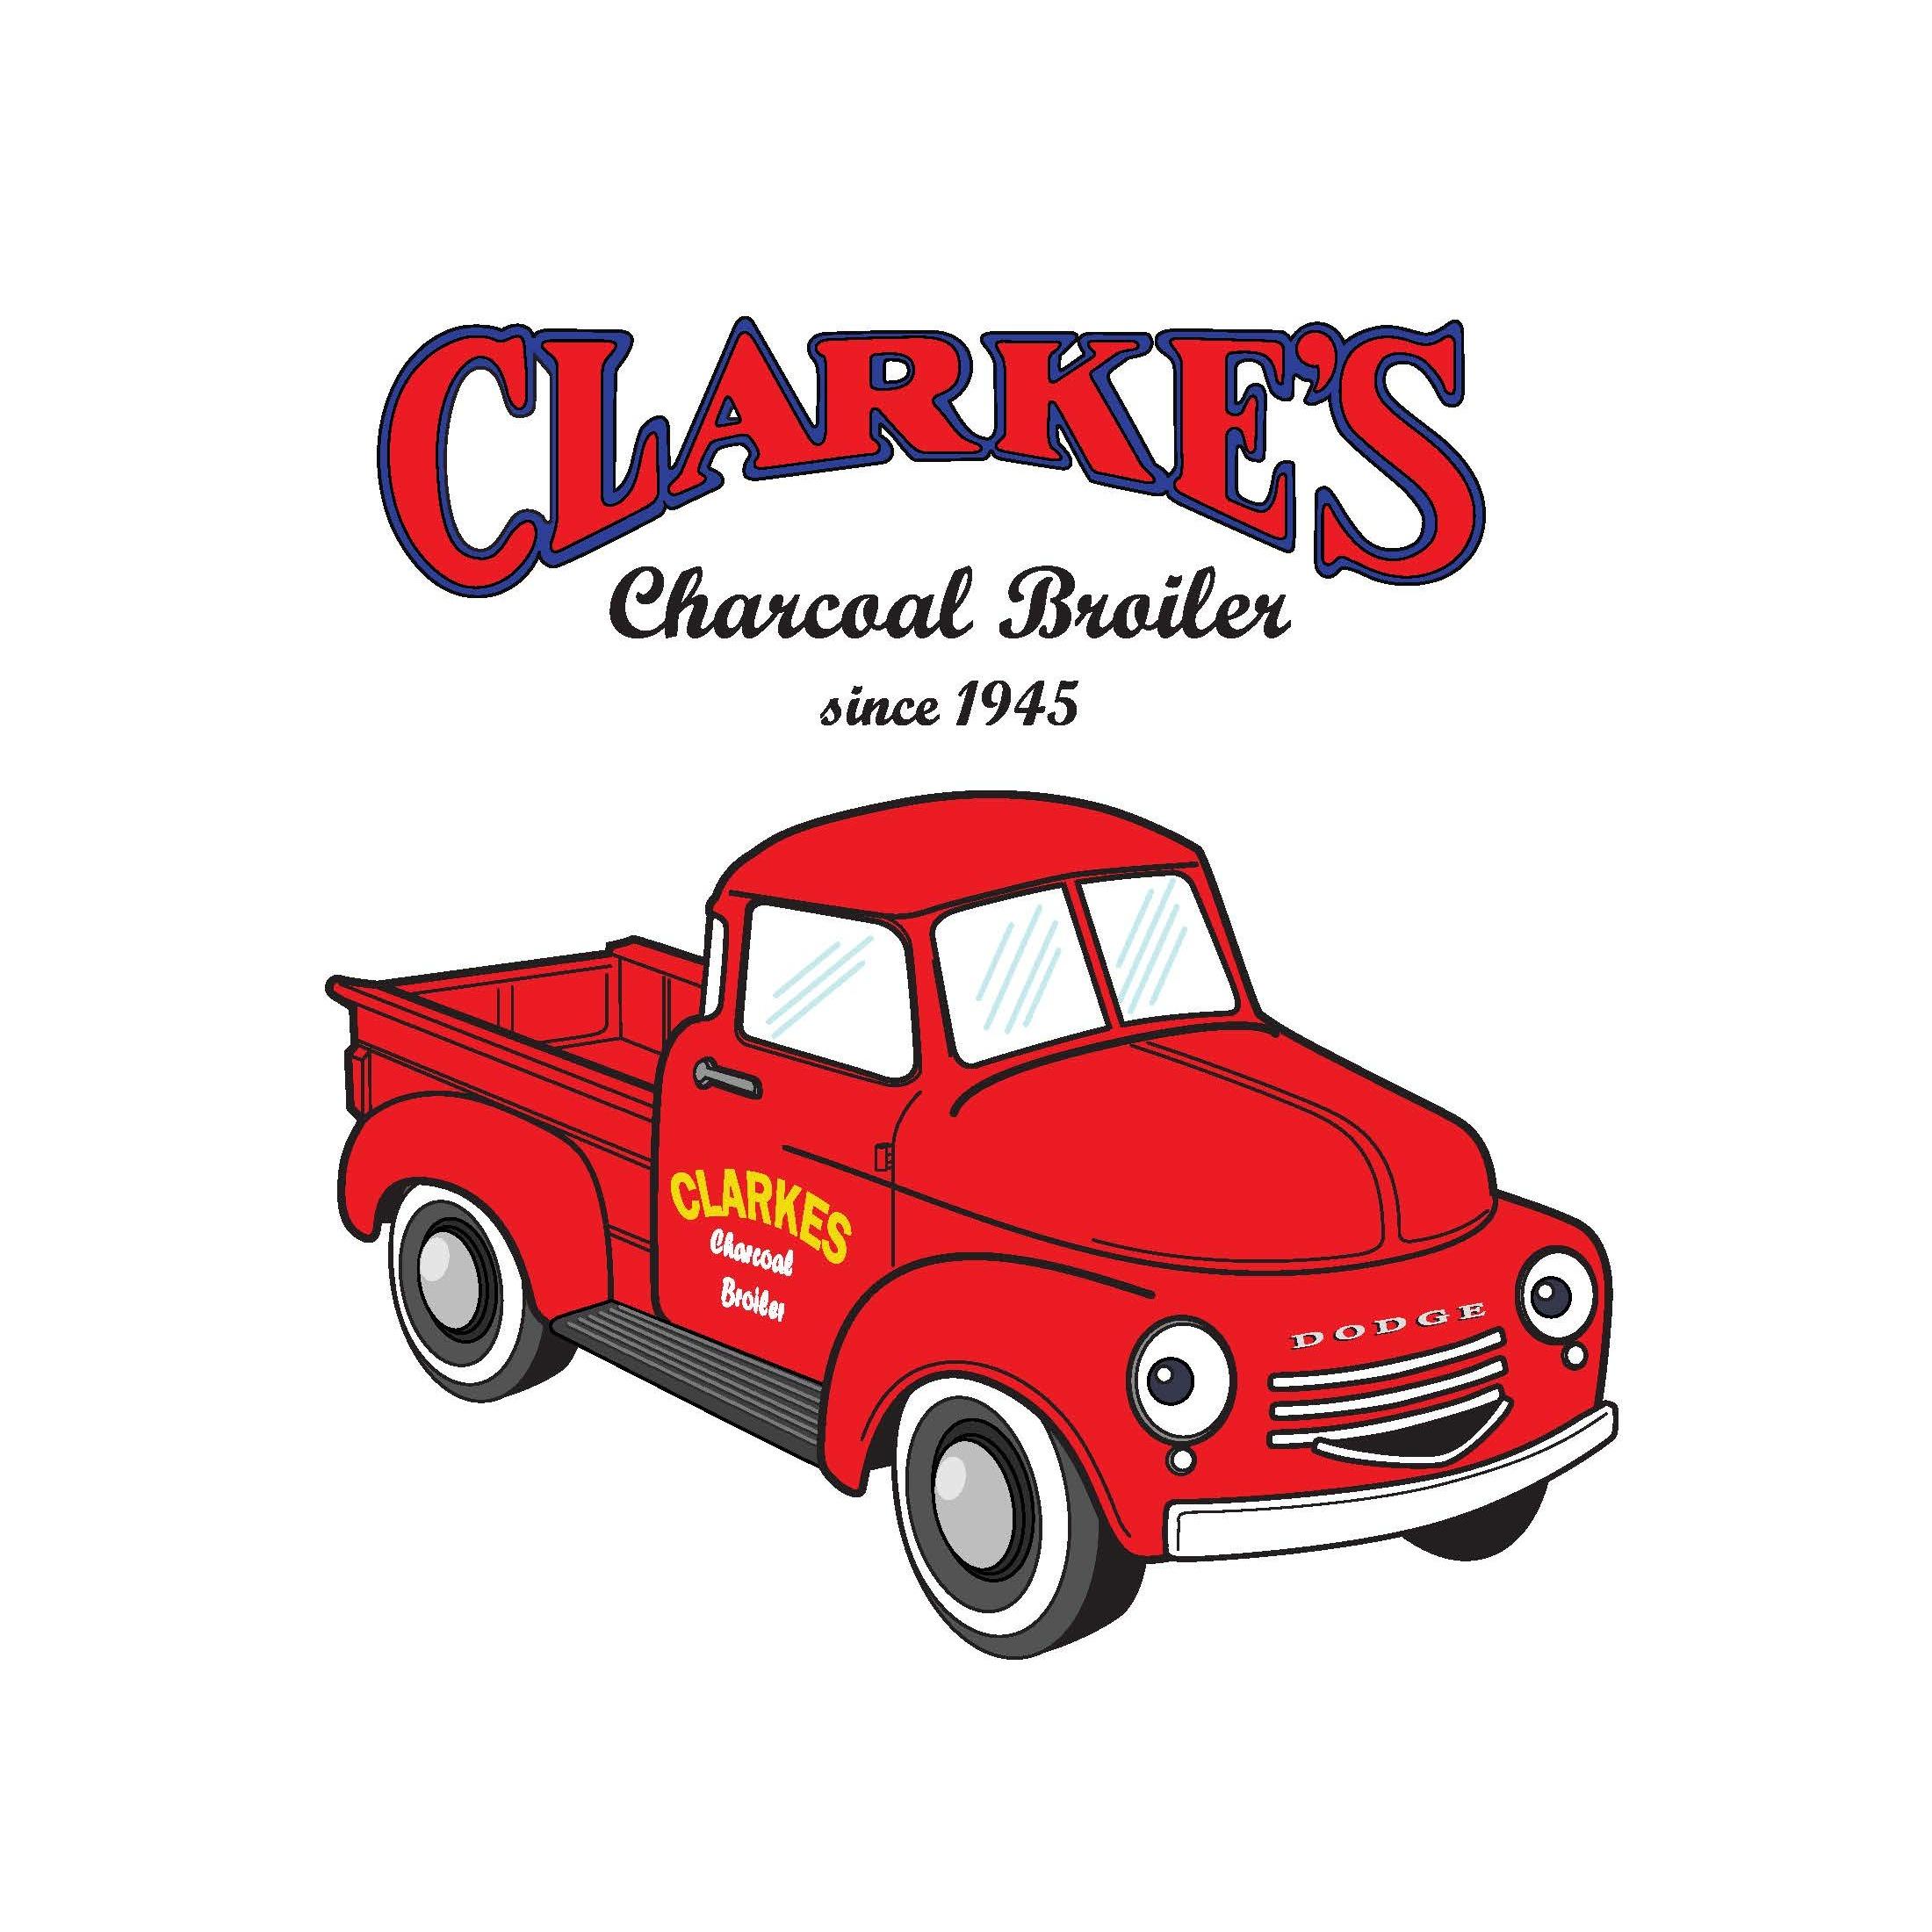 Clarke's Charcoal Broiler